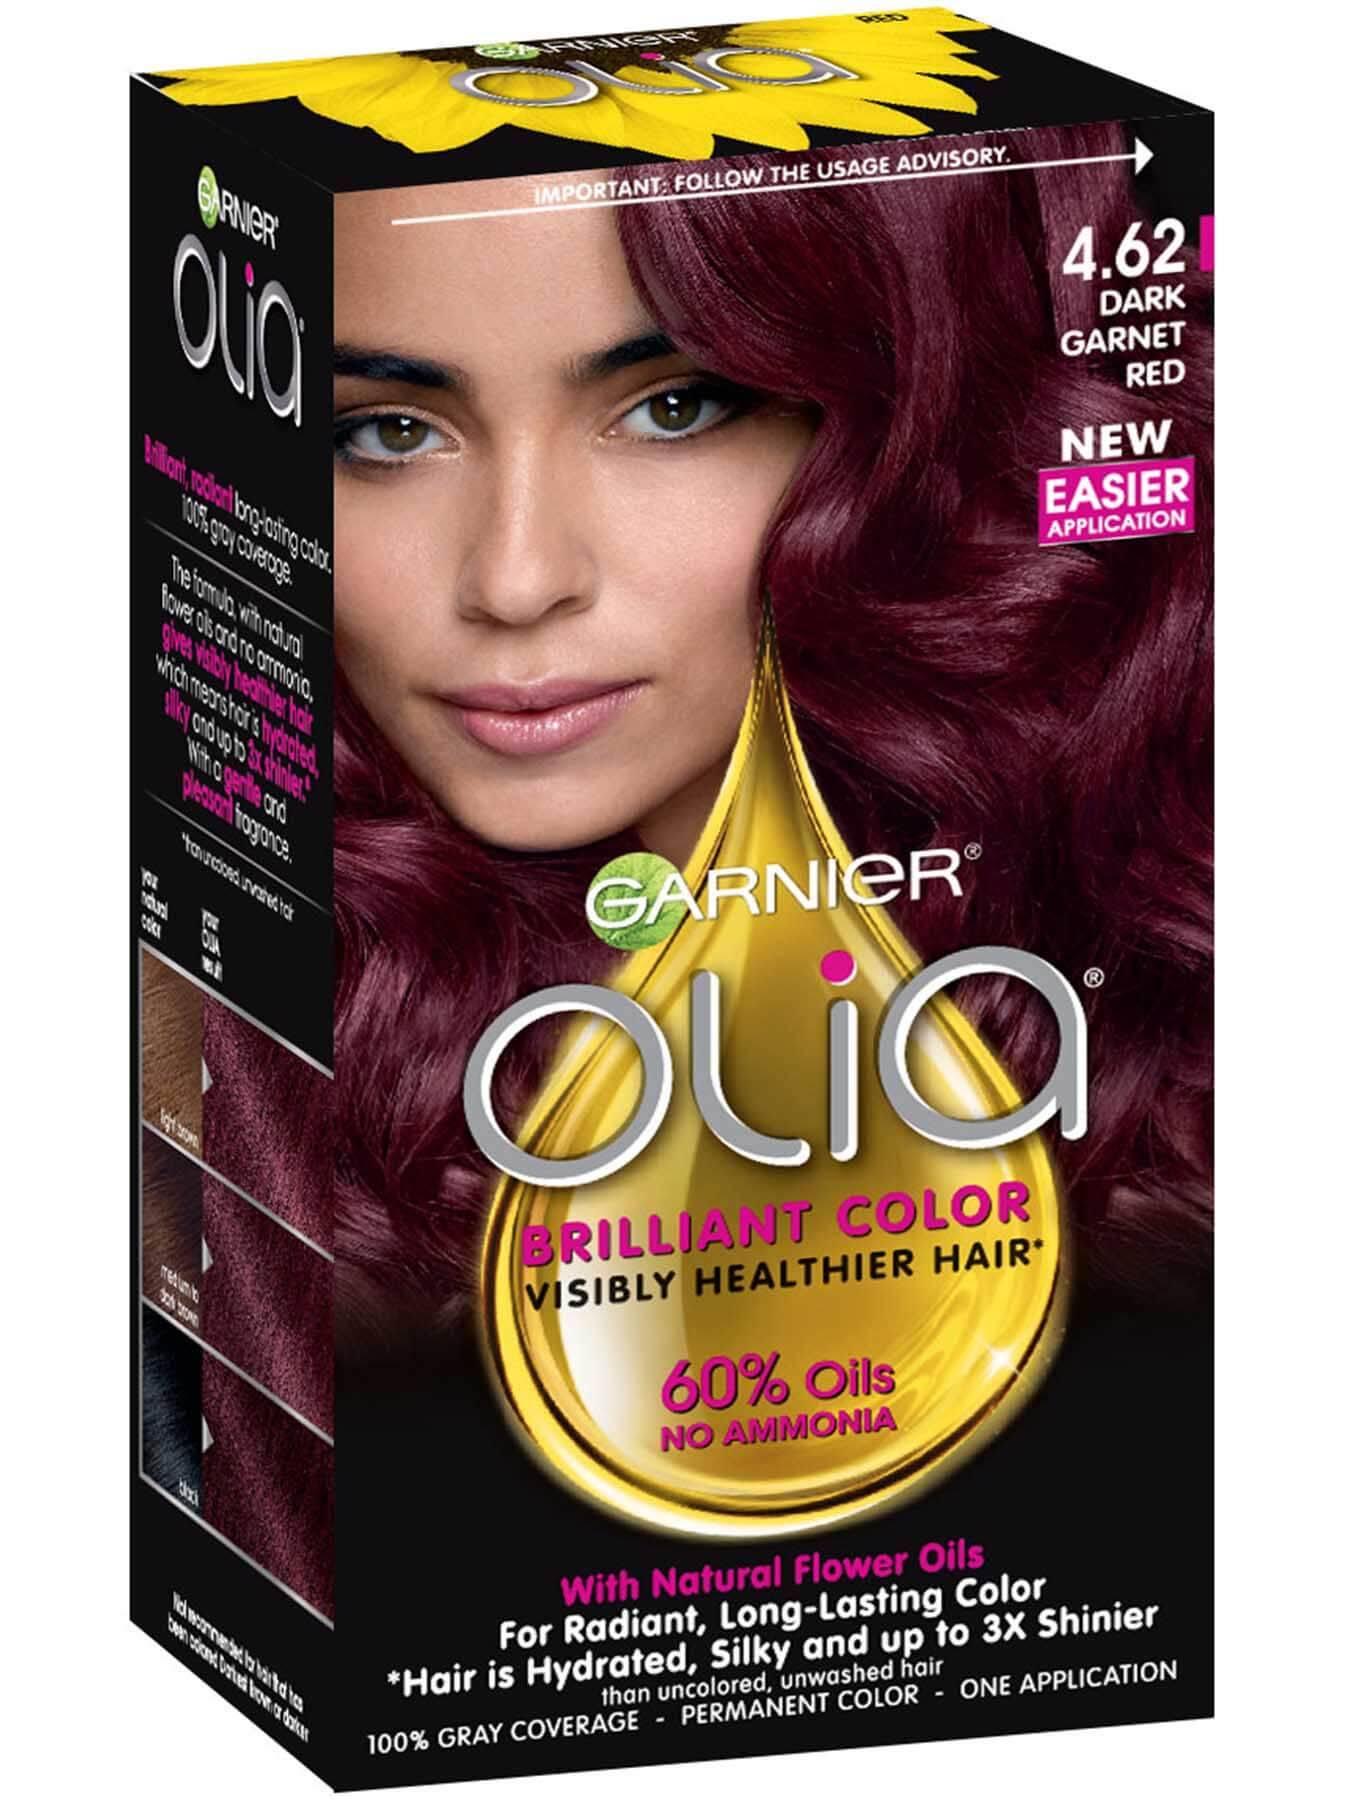 Olia Ammonia Free Permanent Hair Color Deep Garnet Red